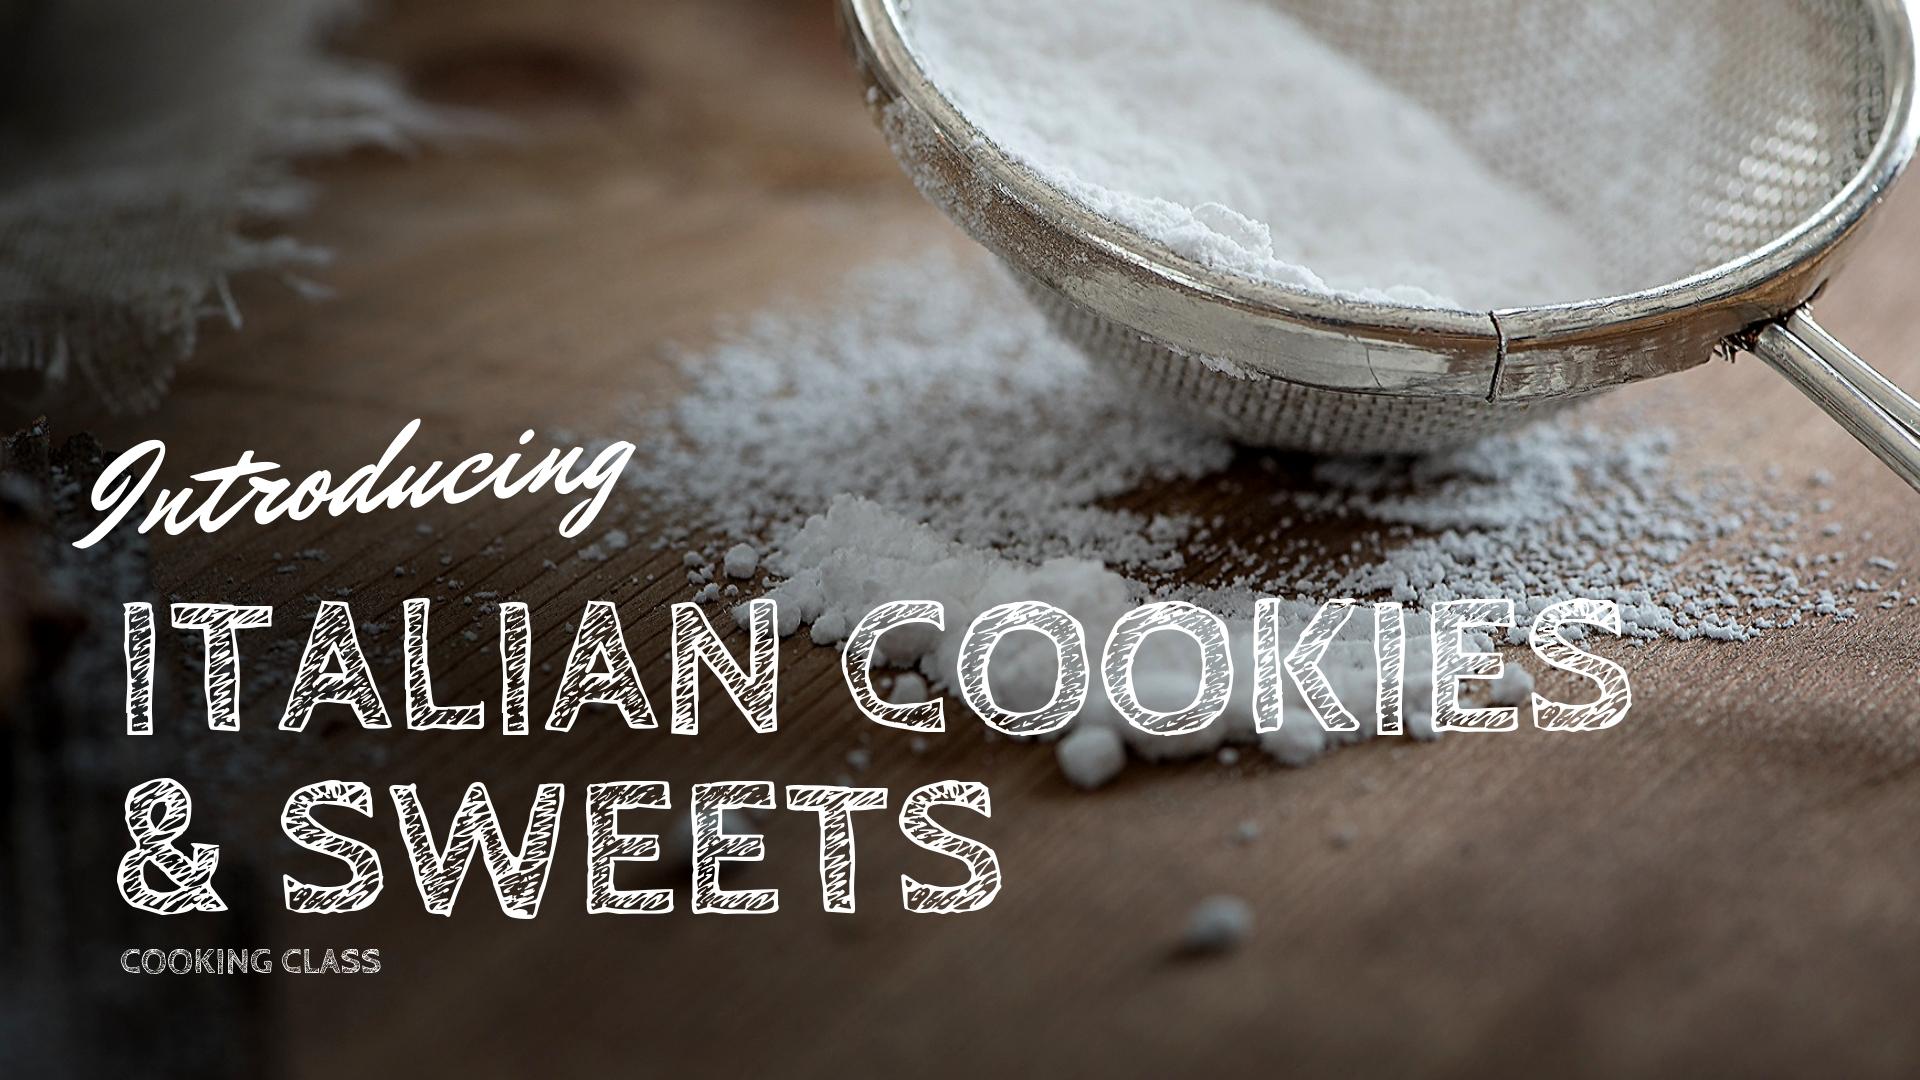 3/24/19 Italian Cookies & Sweets Cooking Class